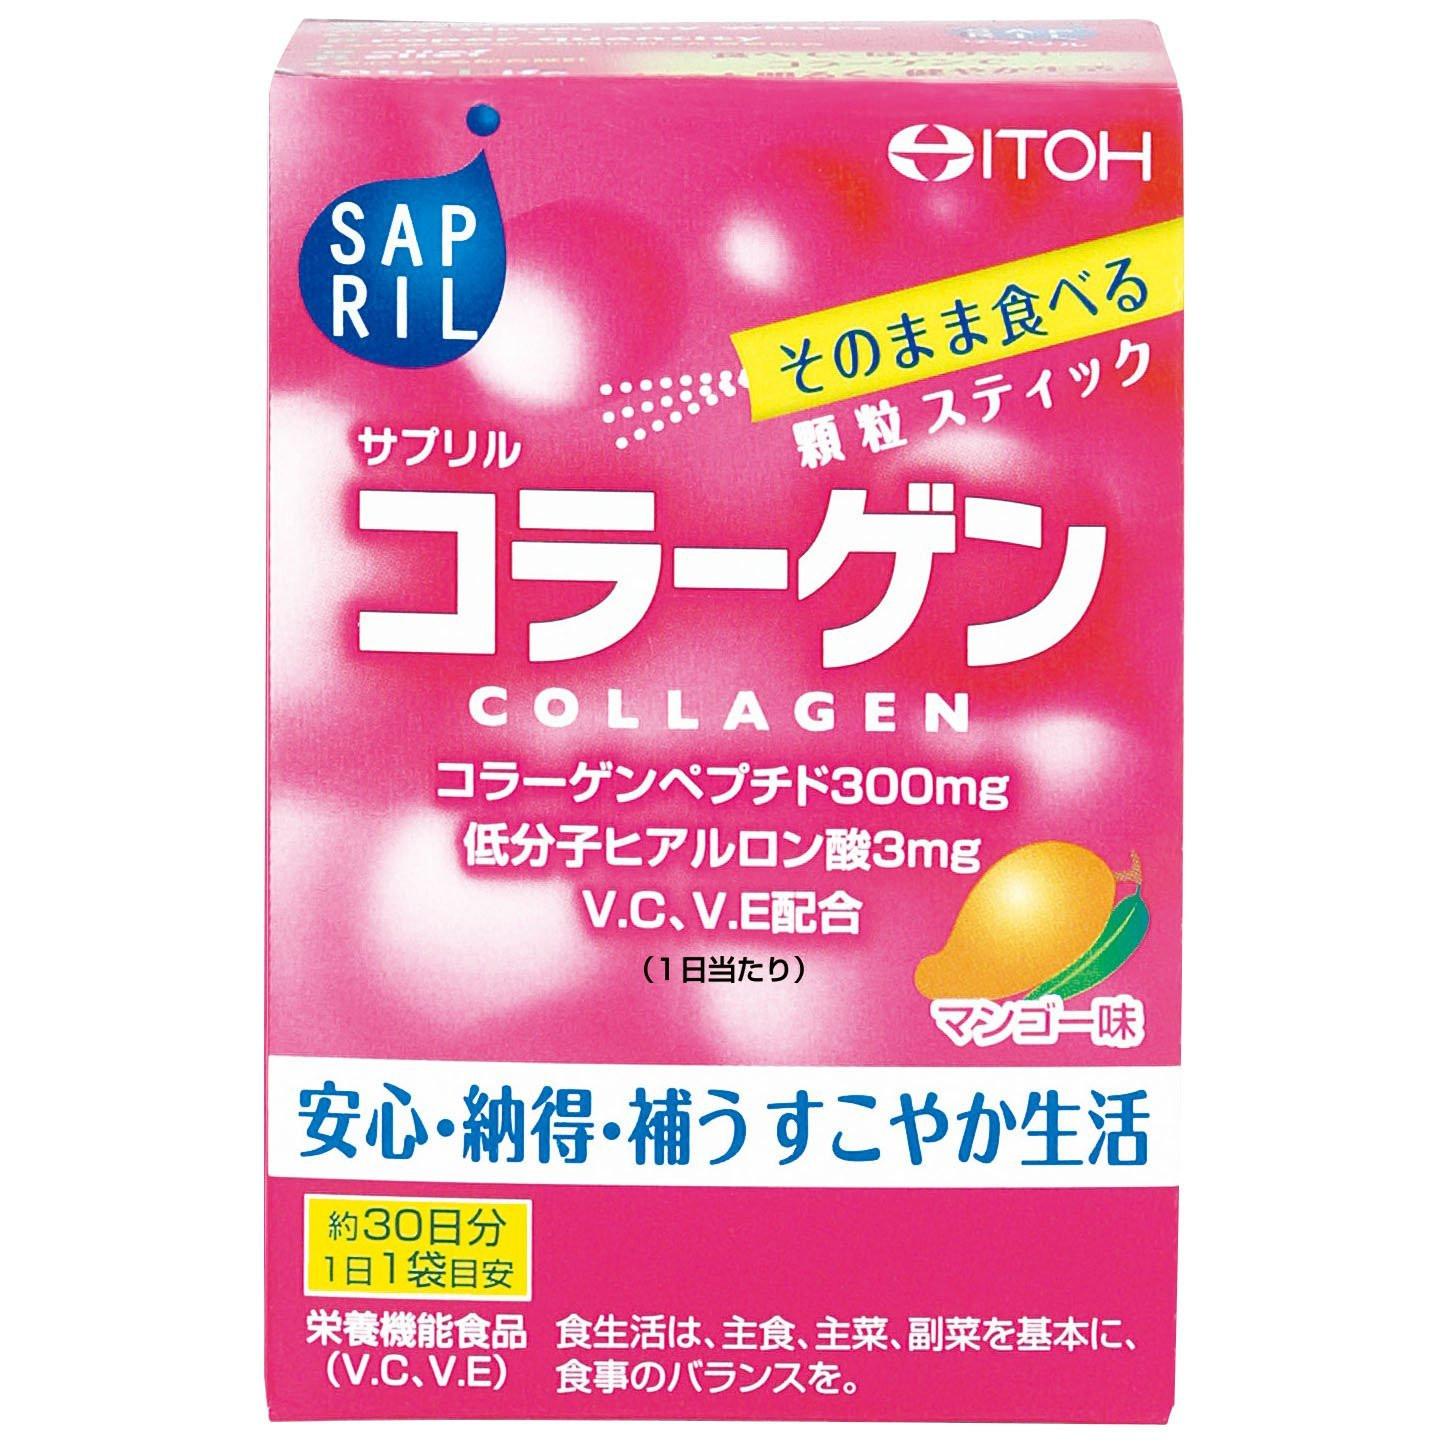 itoh collagen